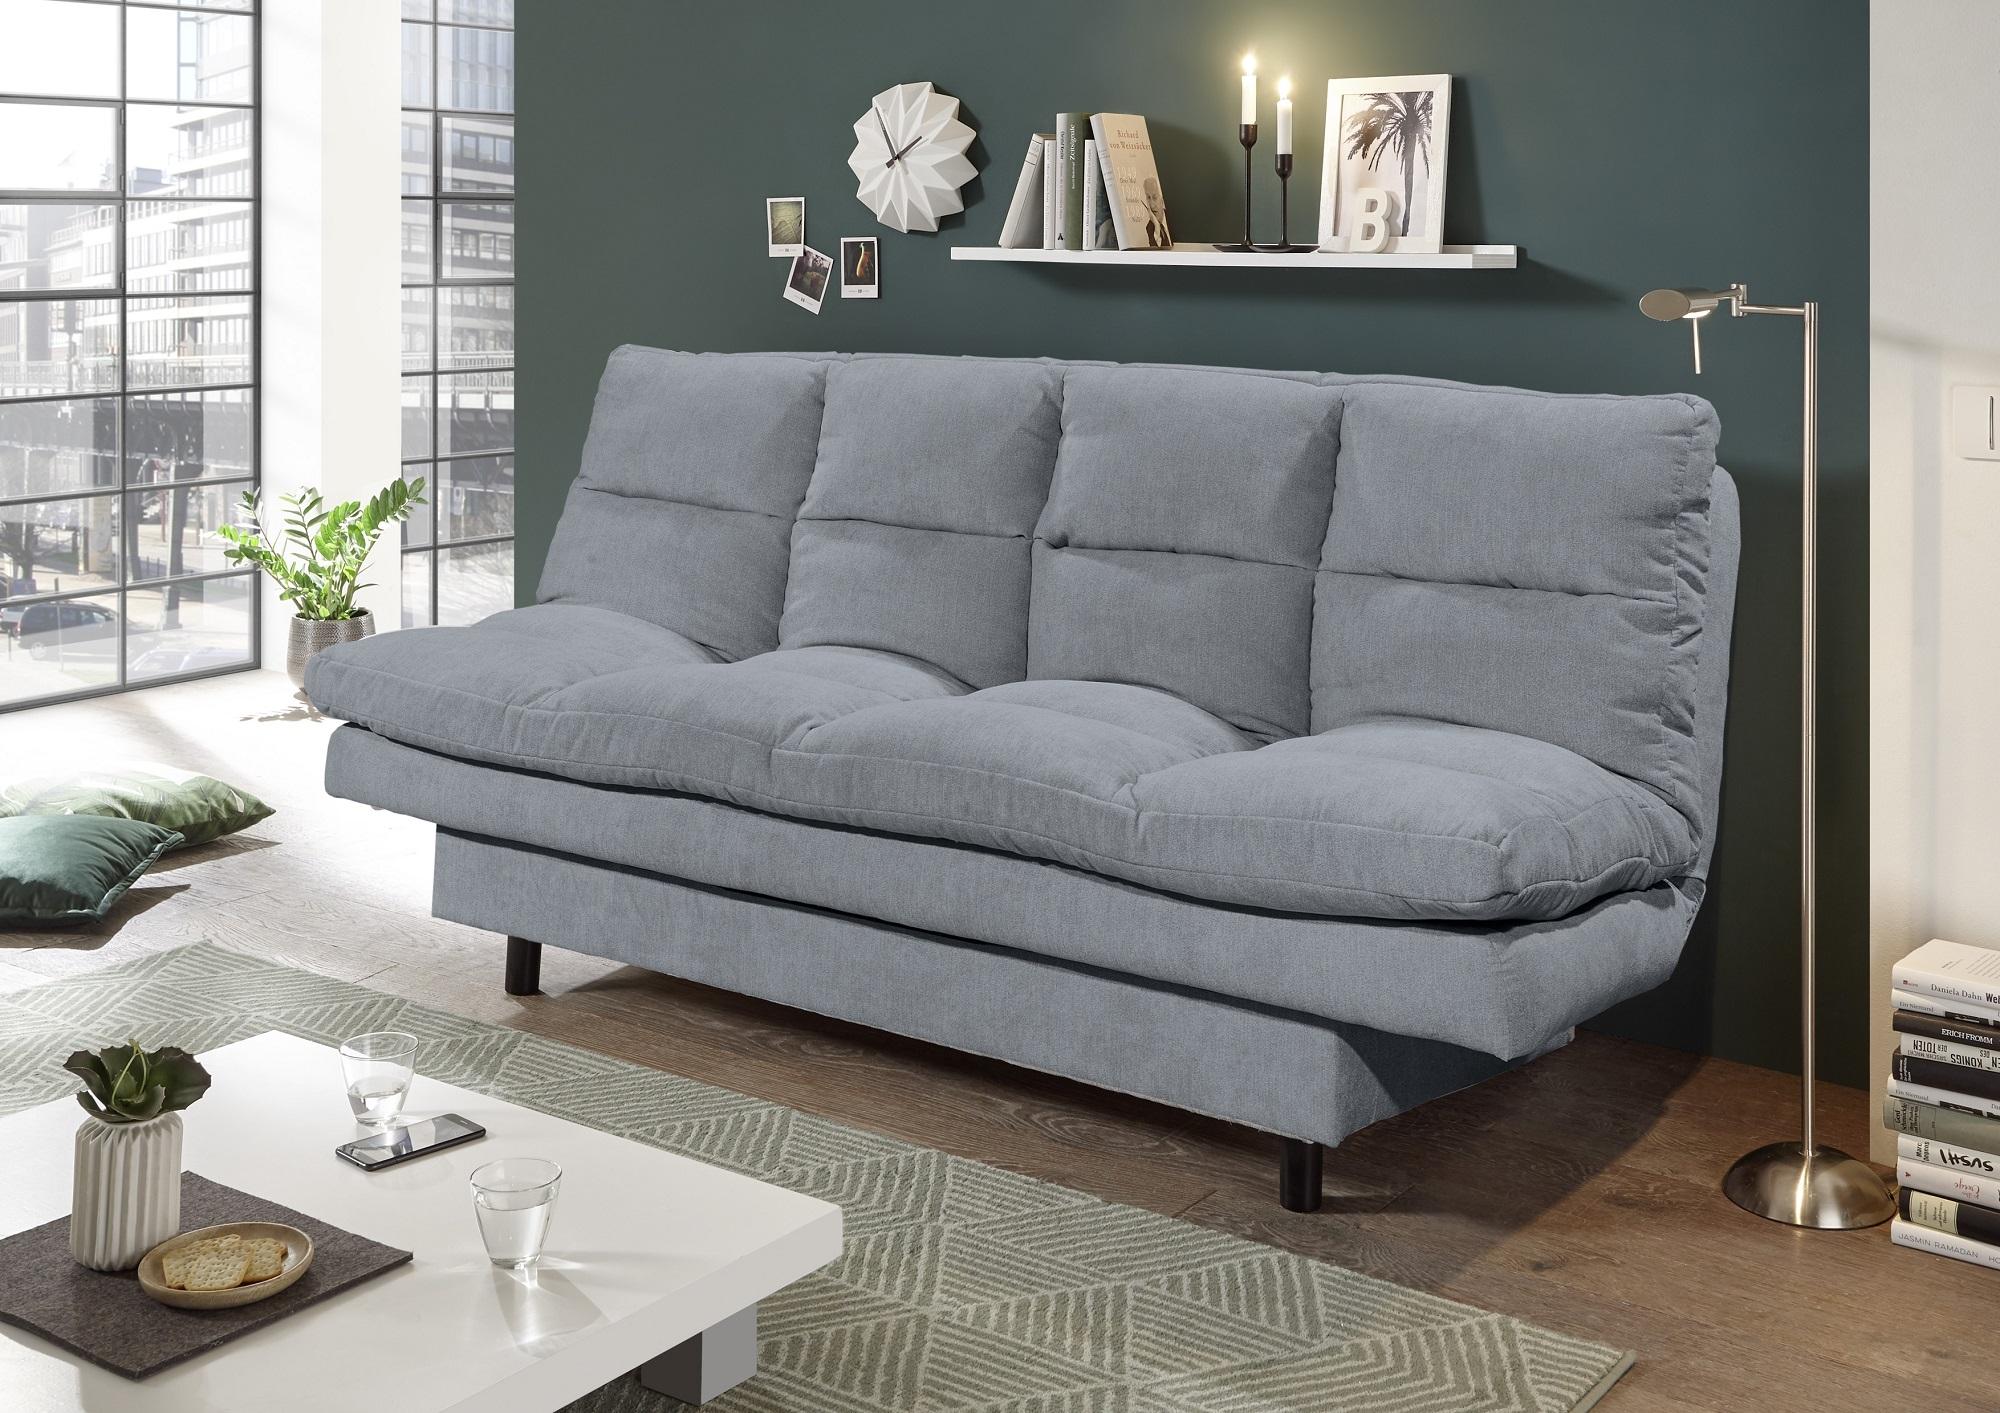 Canapea extensibila tapitata cu stofa, 3 locuri Lotta Antracit, l190xA95xH85 cm somproduct.ro